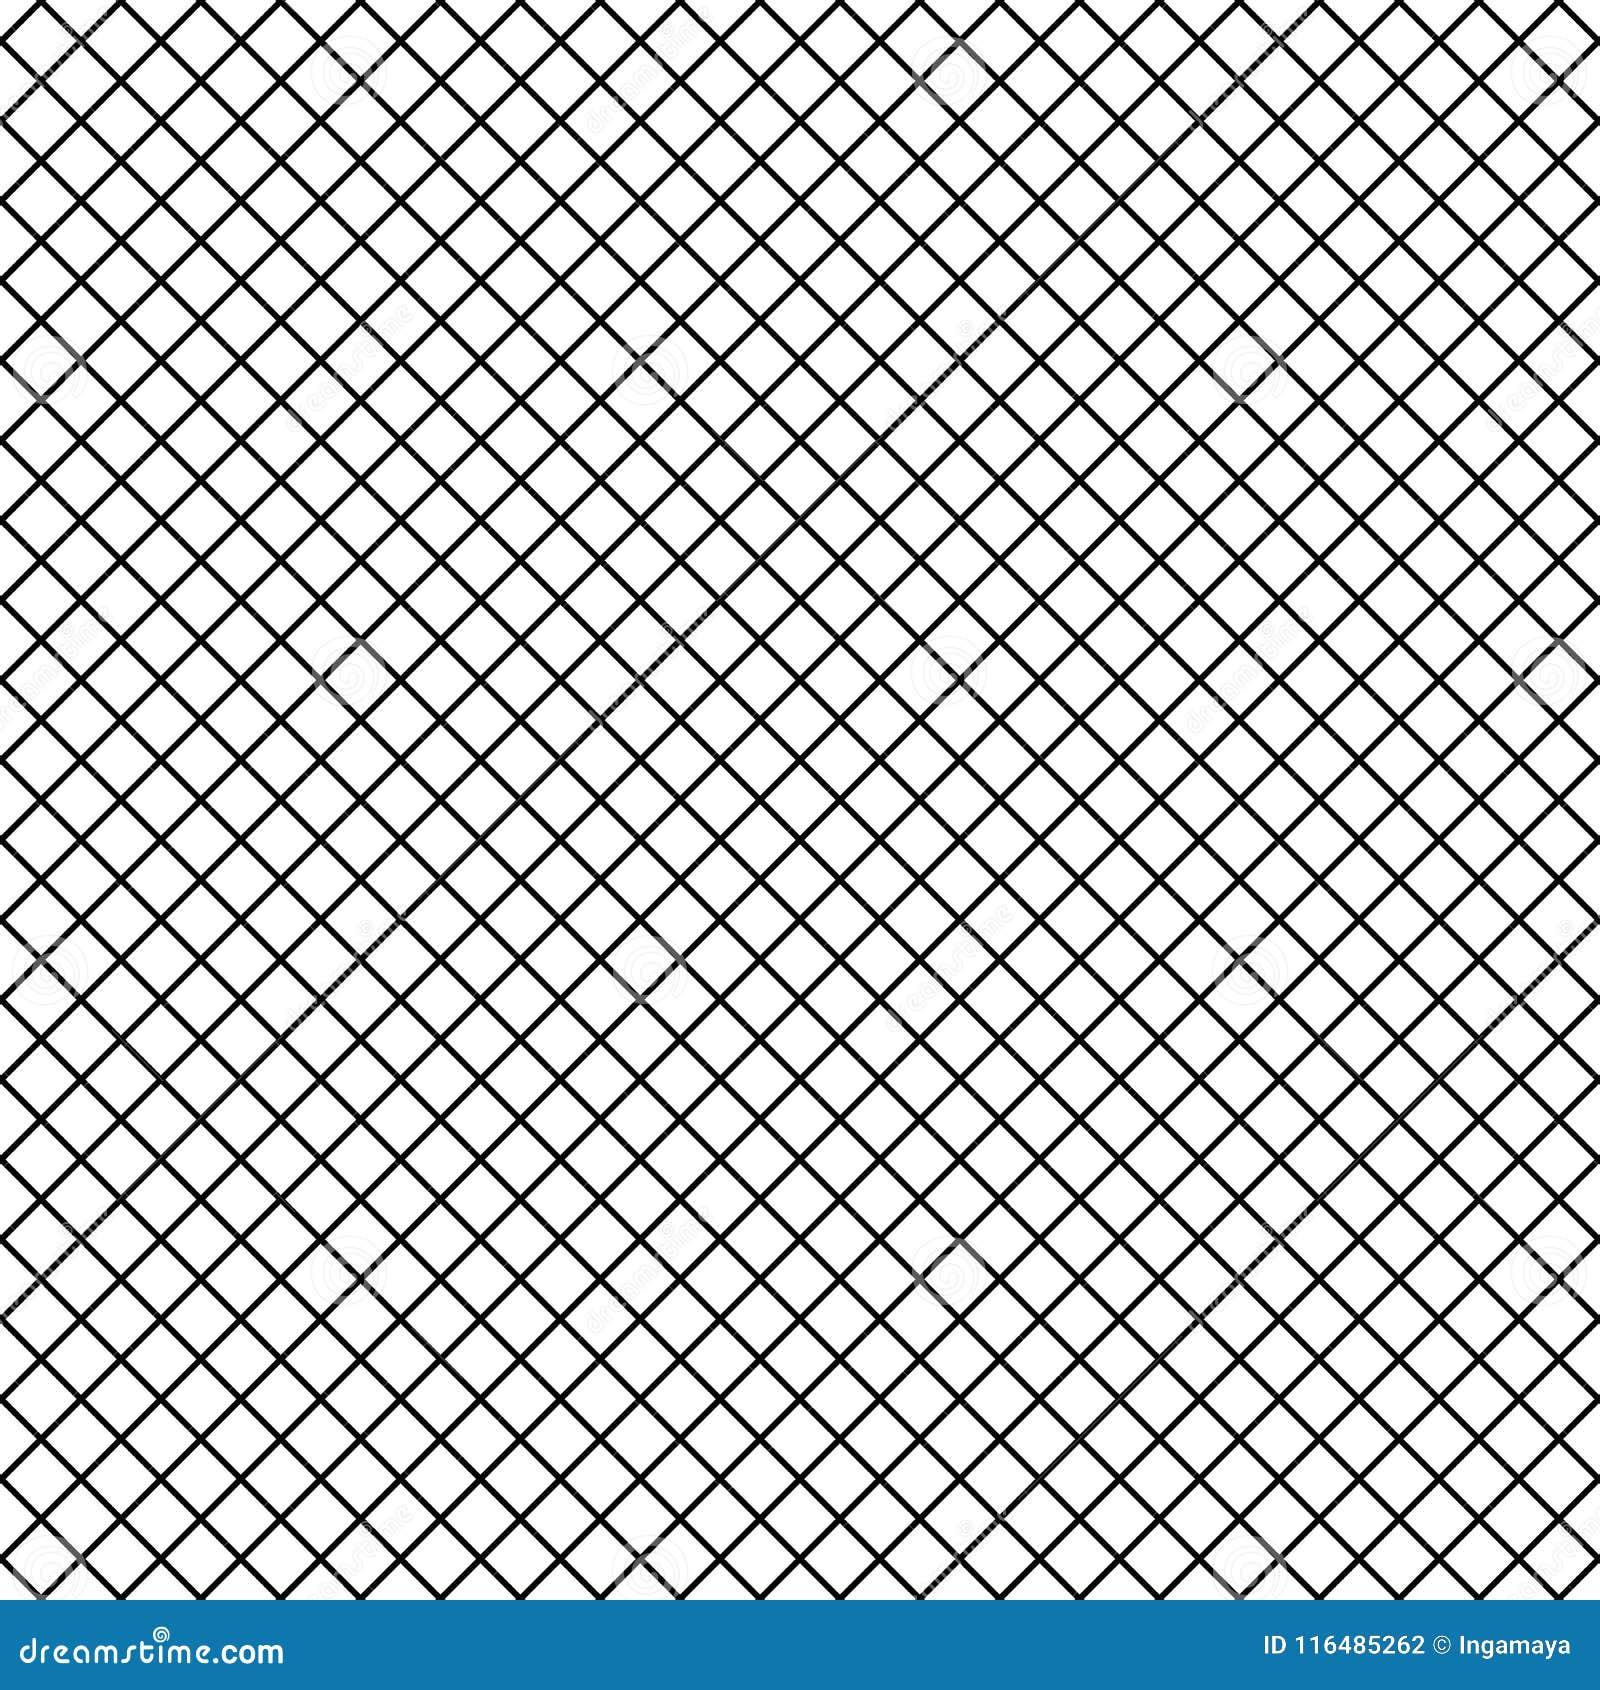 444c5b175 Vector Uniform Grid Fishnet Tights Seamless Pattern. Stock Vector ...